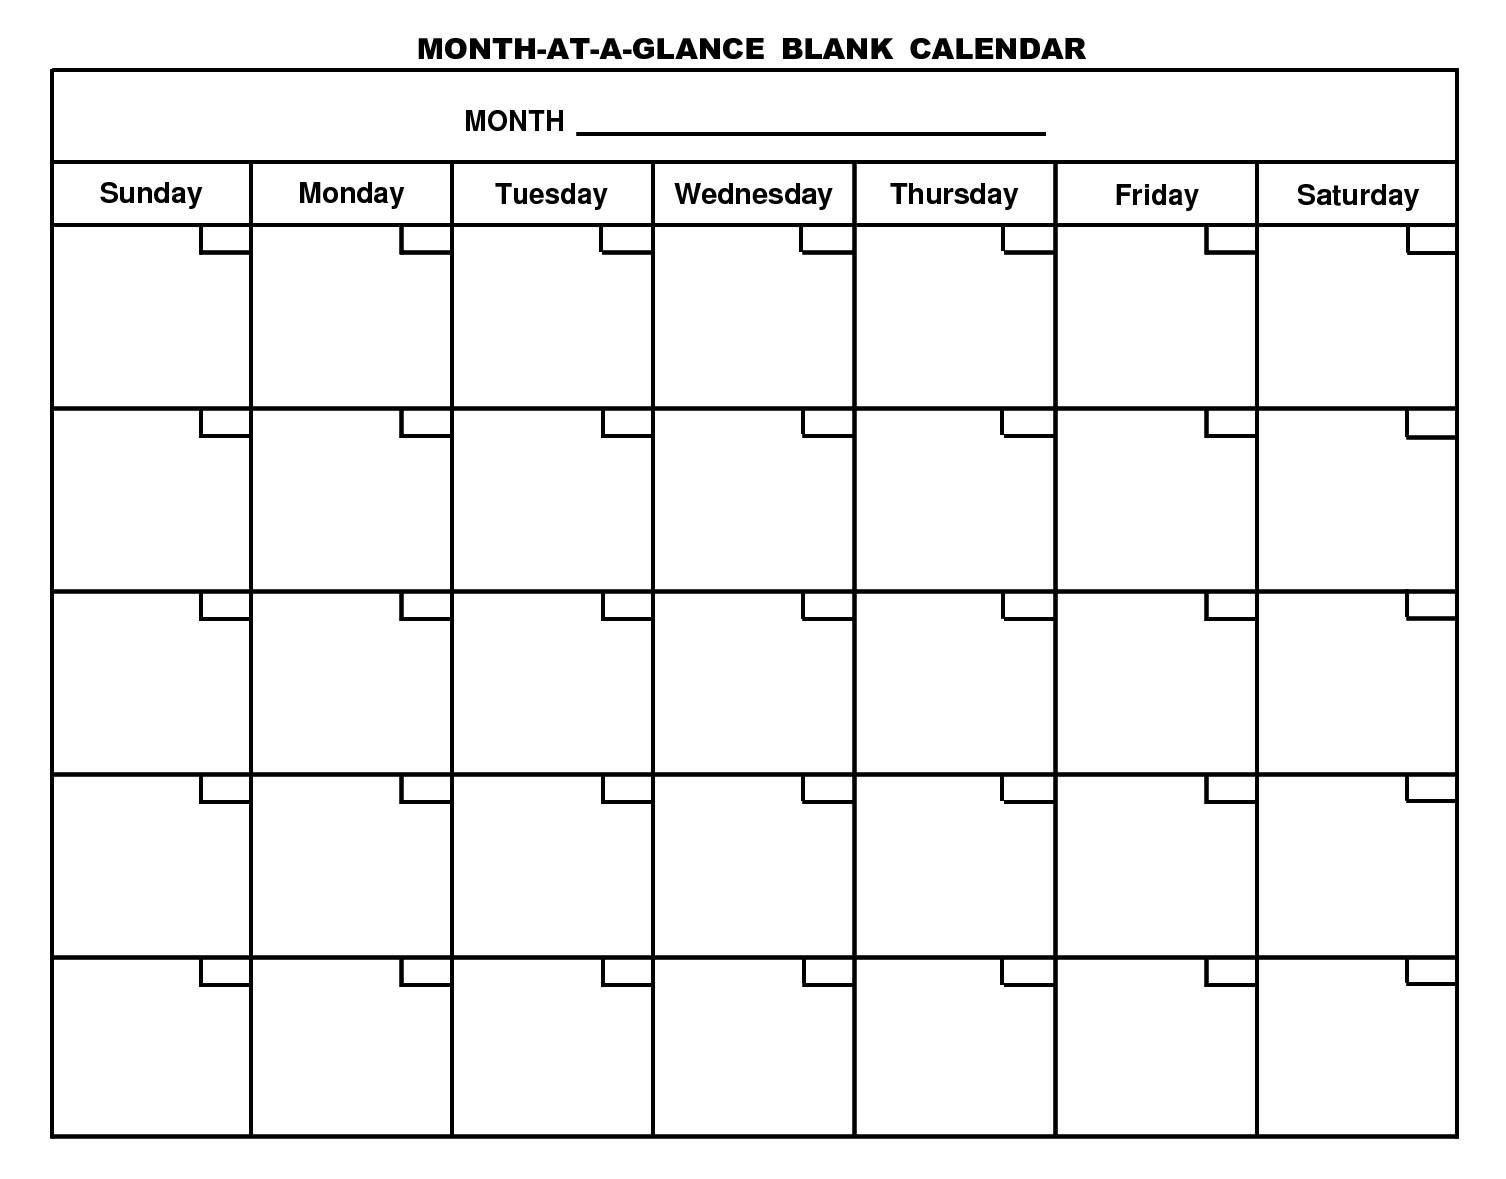 Pinstacy Tangren On Work   Blank Monthly Calendar